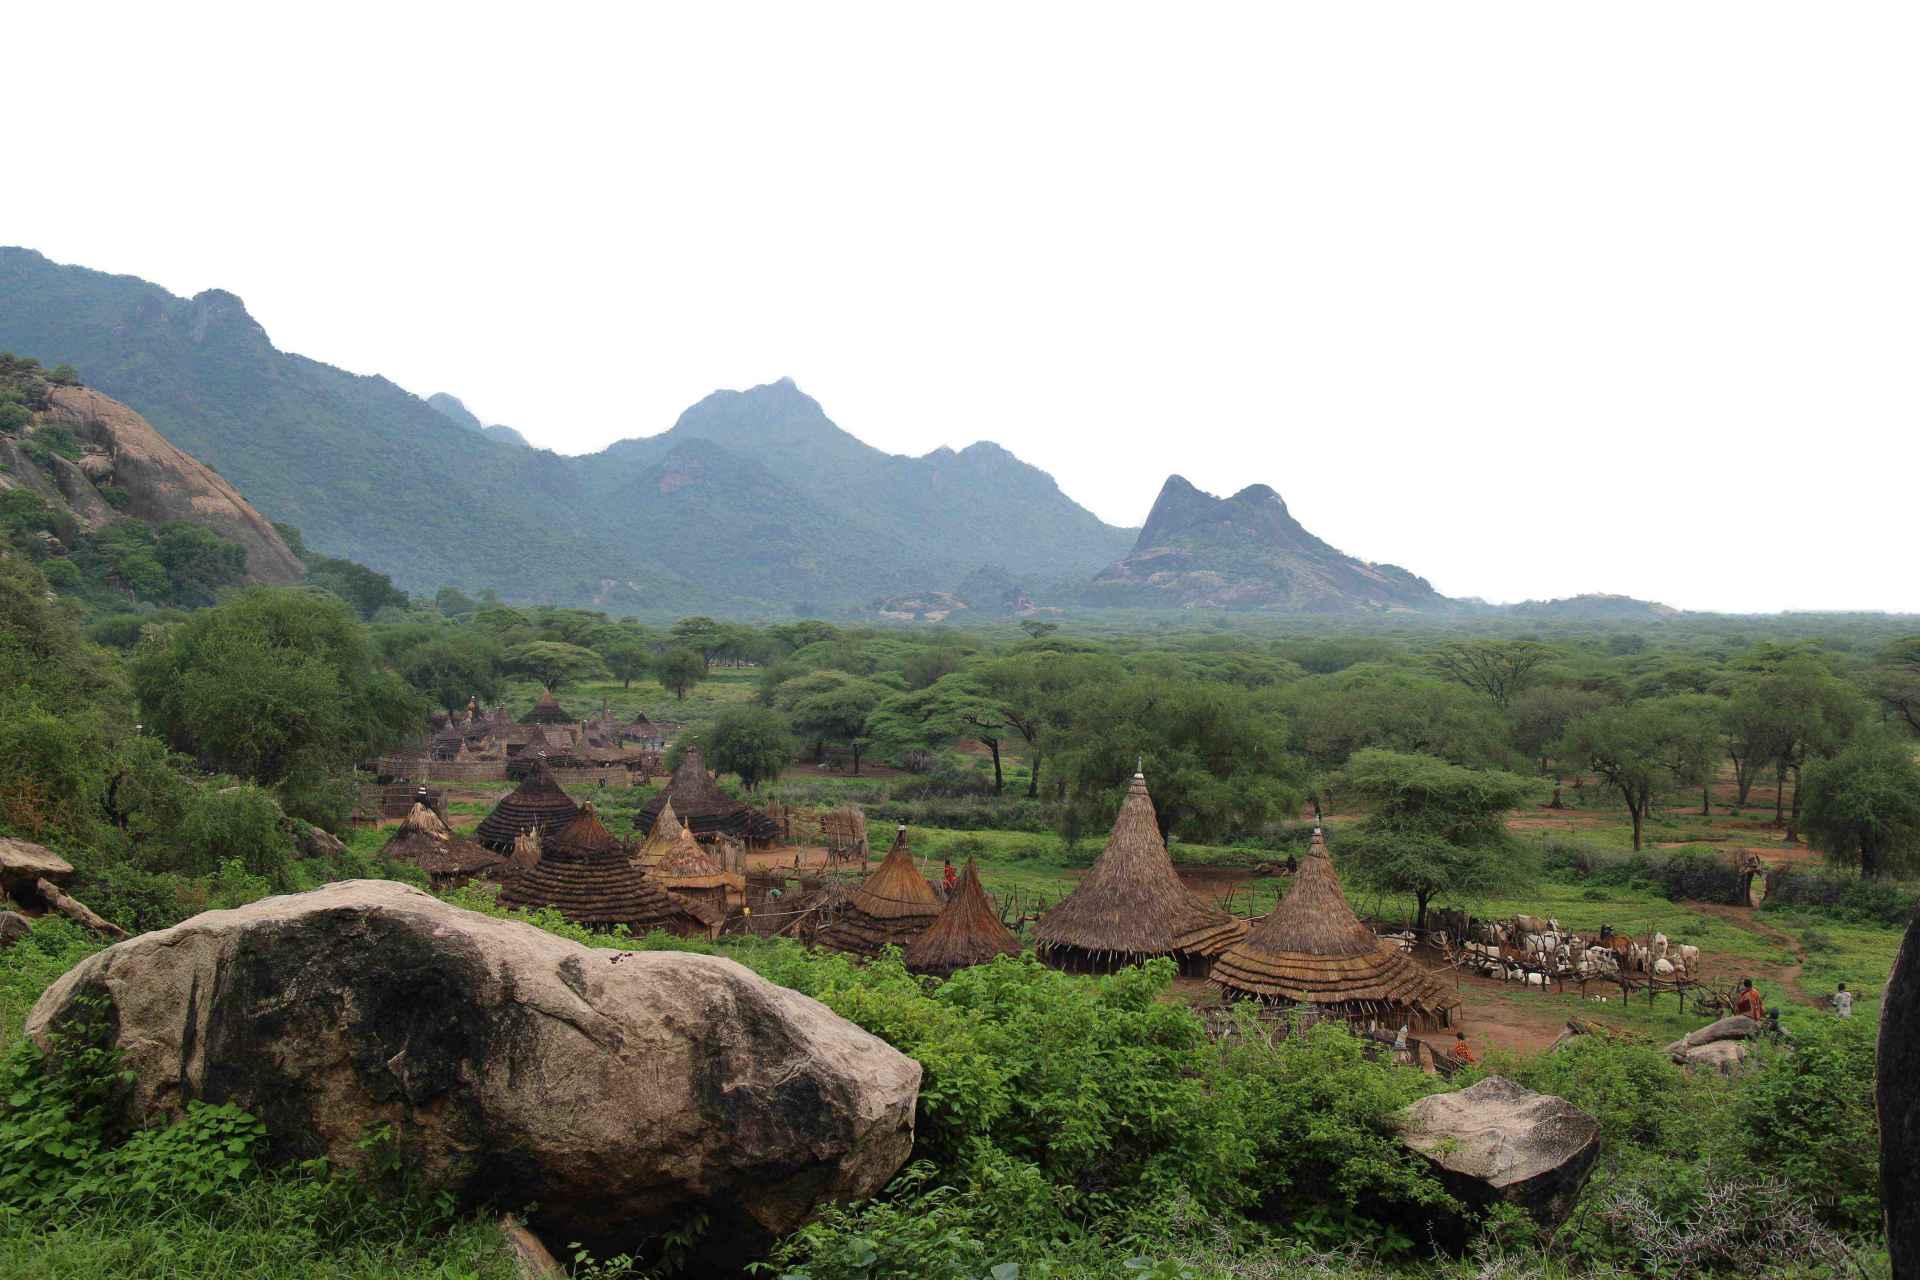 Custom-Travel-Planner-Network-Central-Africa-South-Sudan